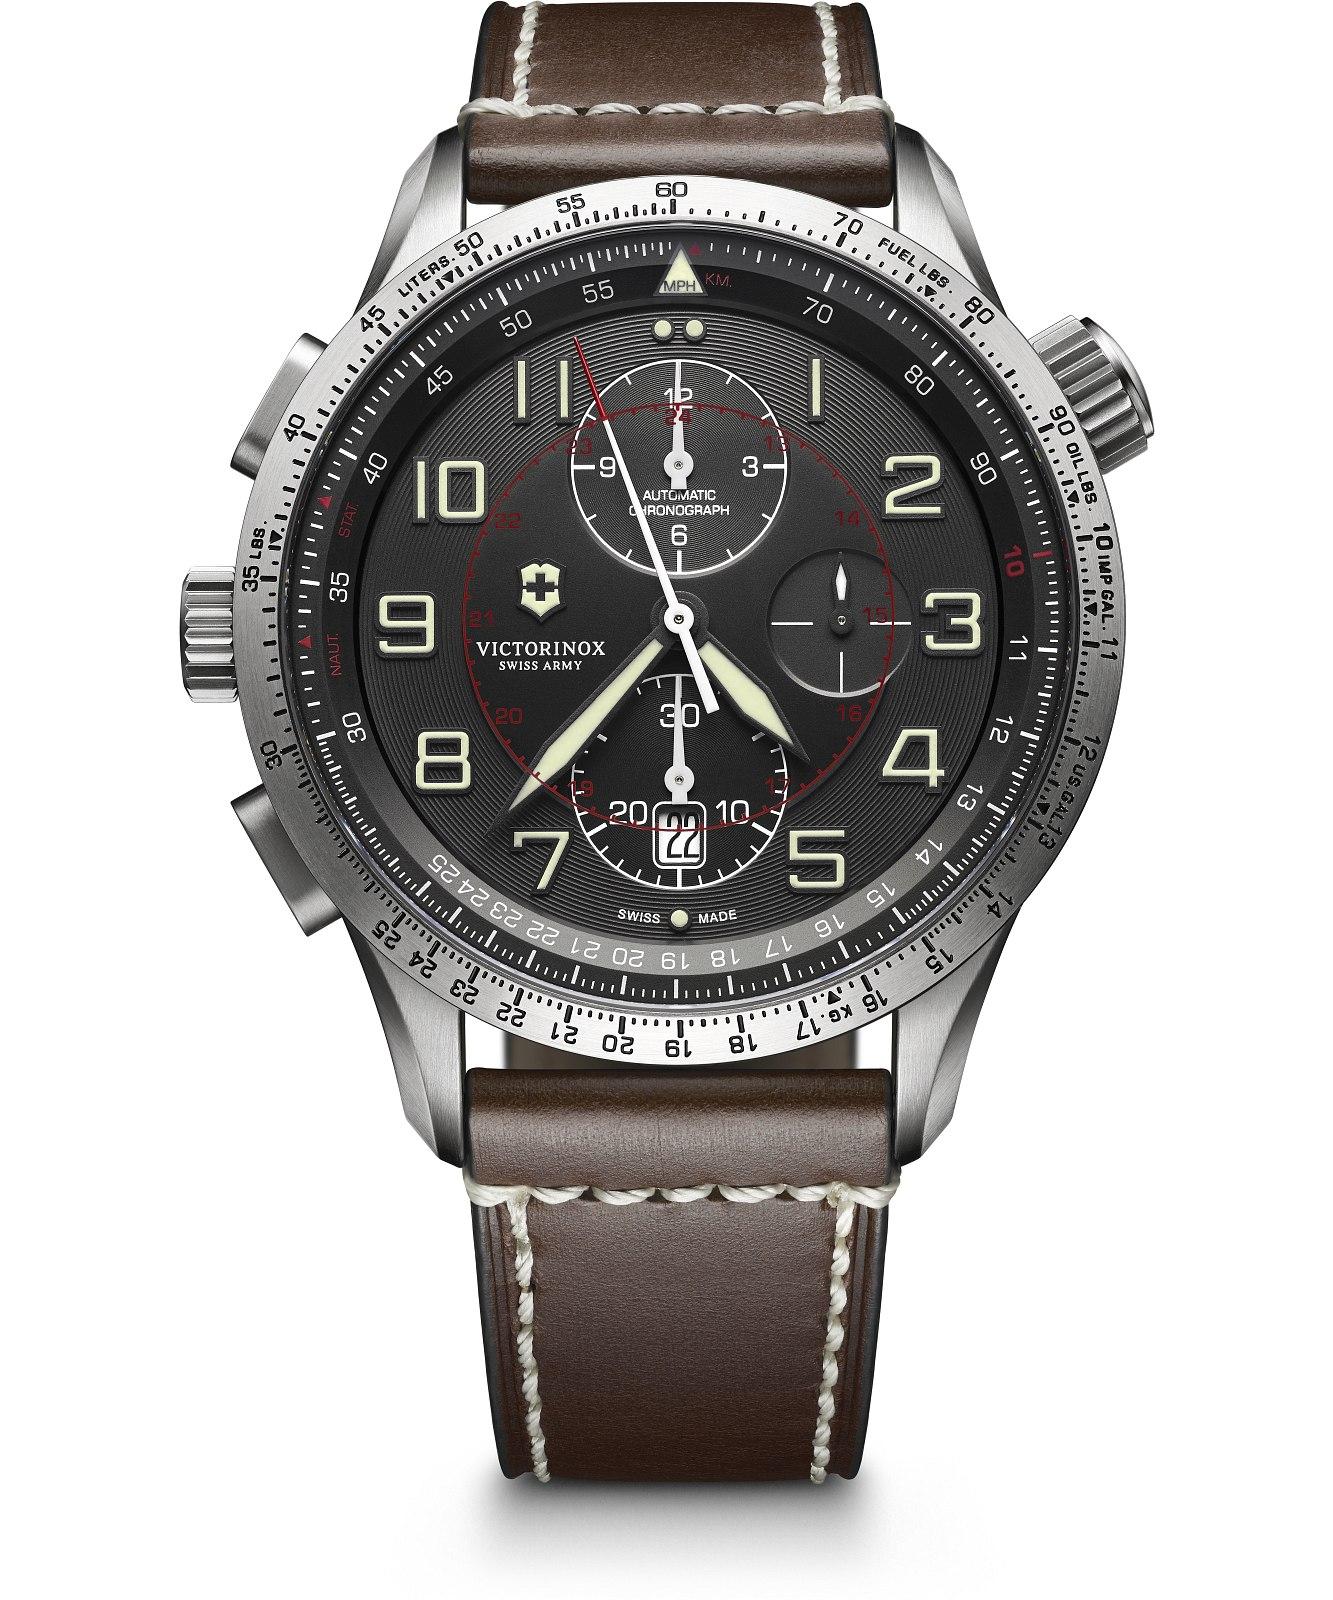 Zegarek męski Victorinox Airboss Mach 9 Automatic Valjoux Chronograph 241710